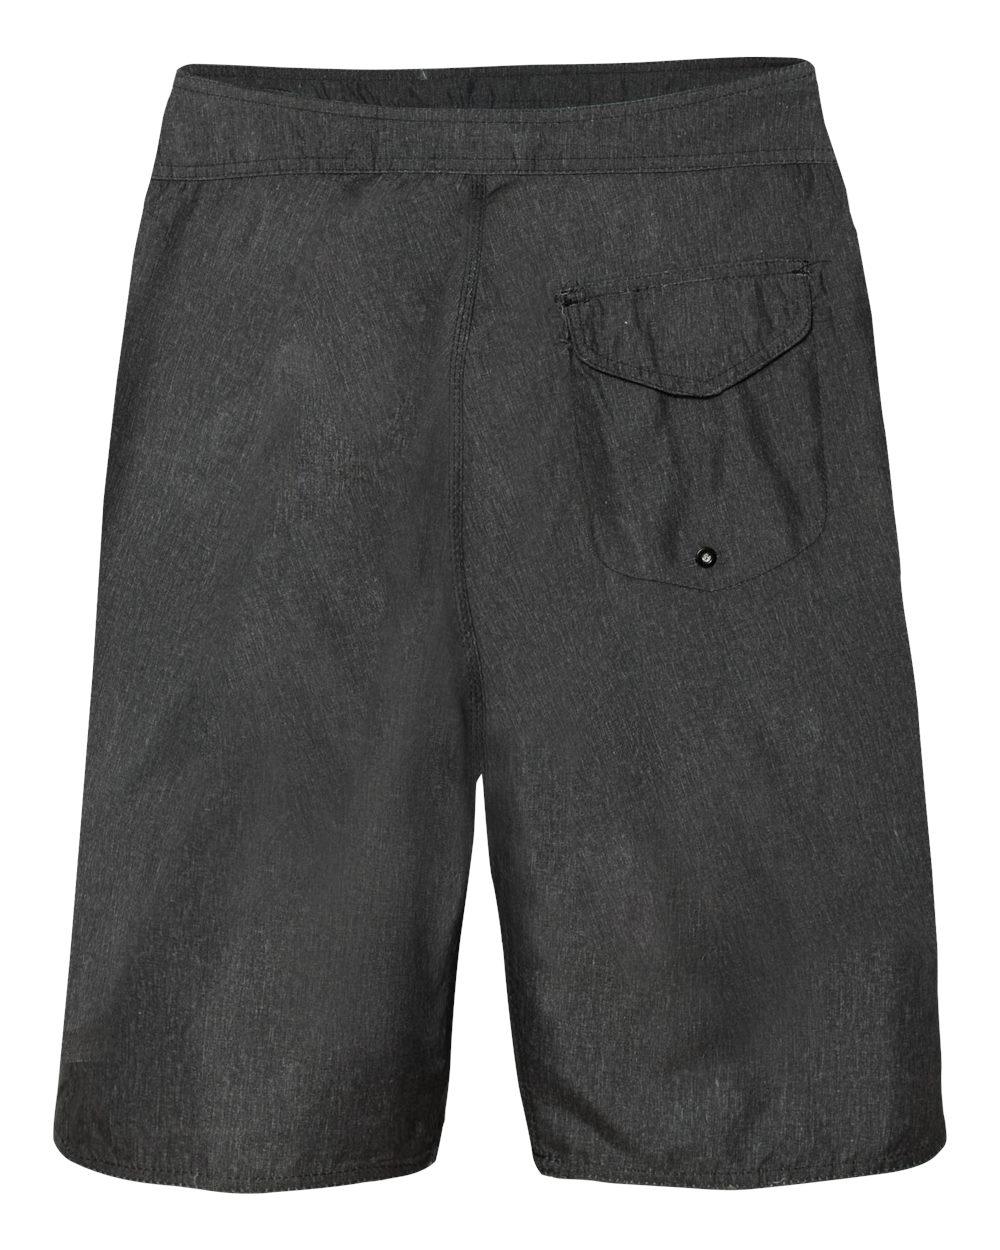 Burnside-Men-039-s-Heathered-Board-Shorts-B9305-30-40 thumbnail 7